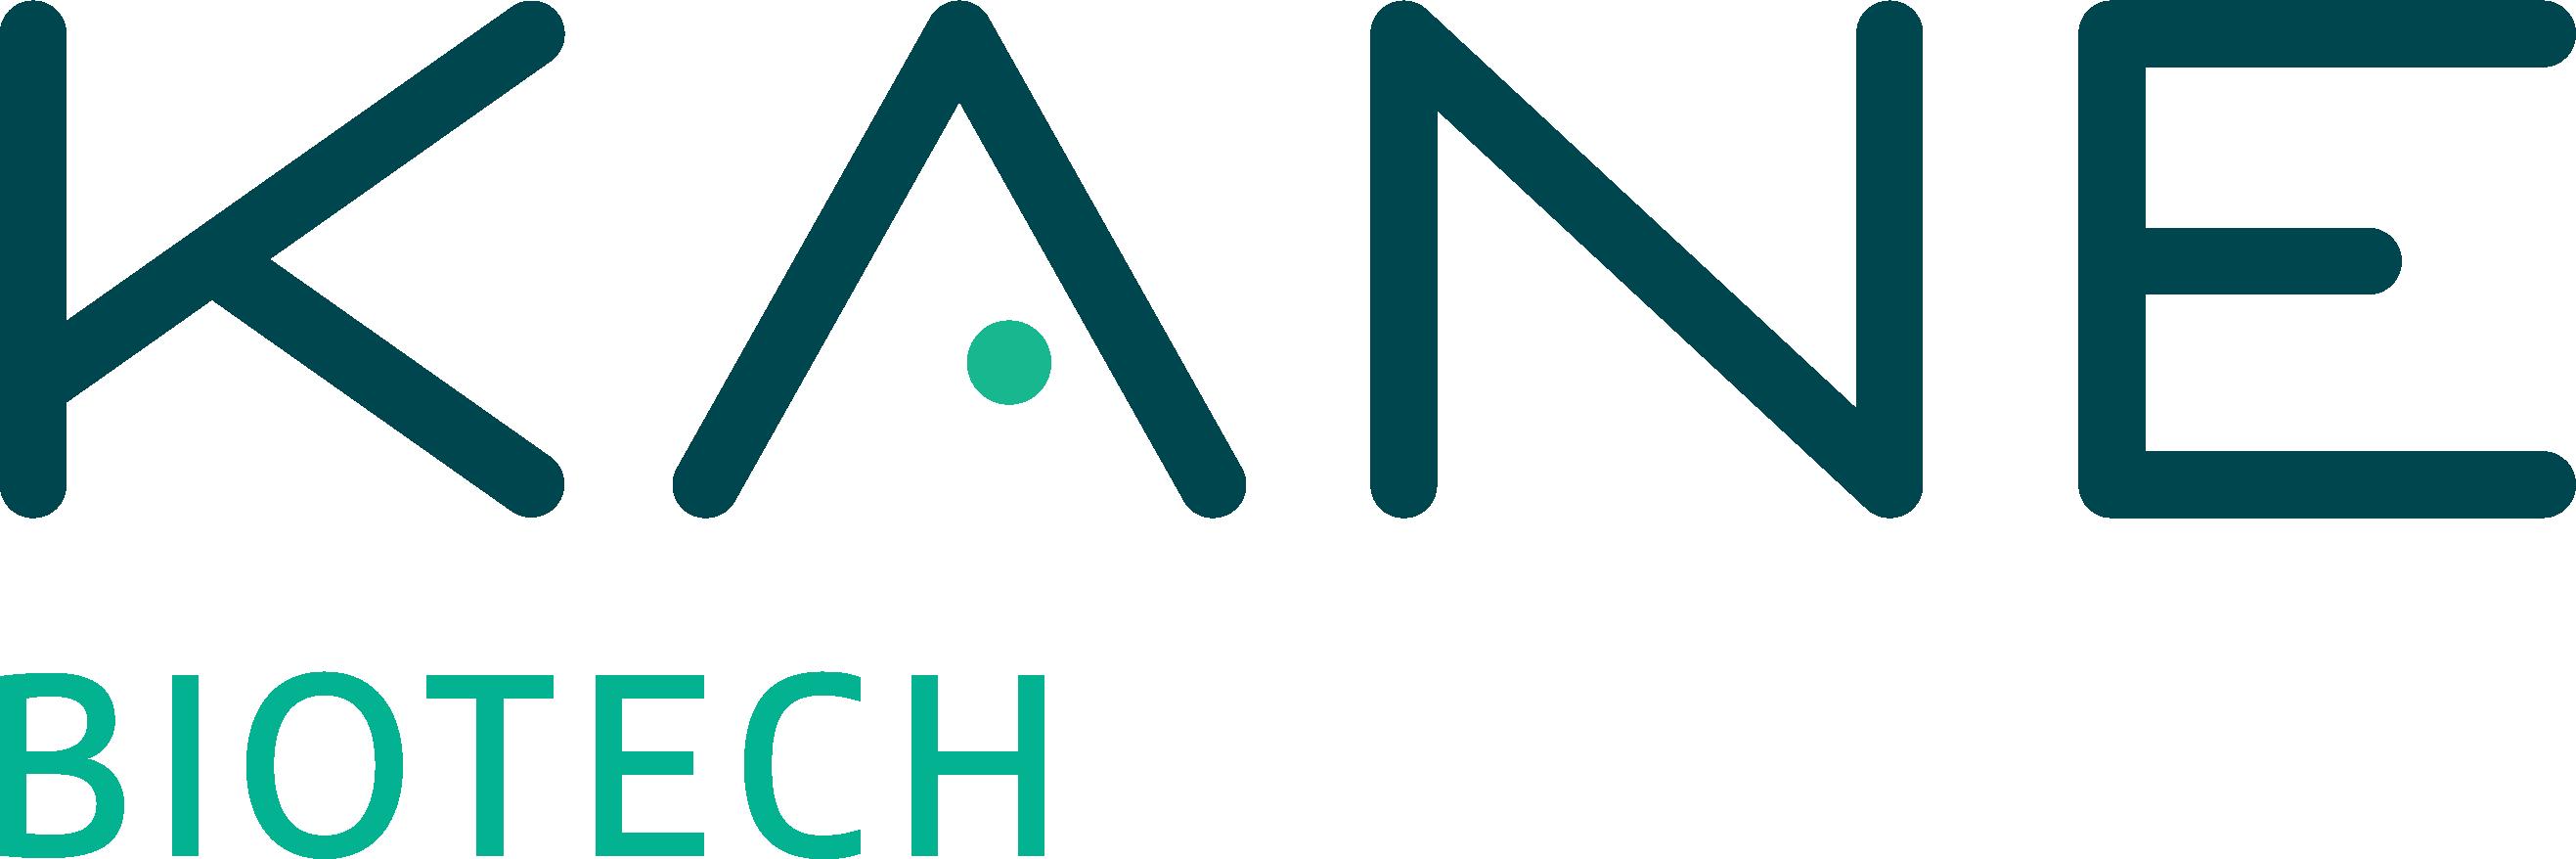 Kane Biotech Recommences Trading on the OTCQB Venture Market